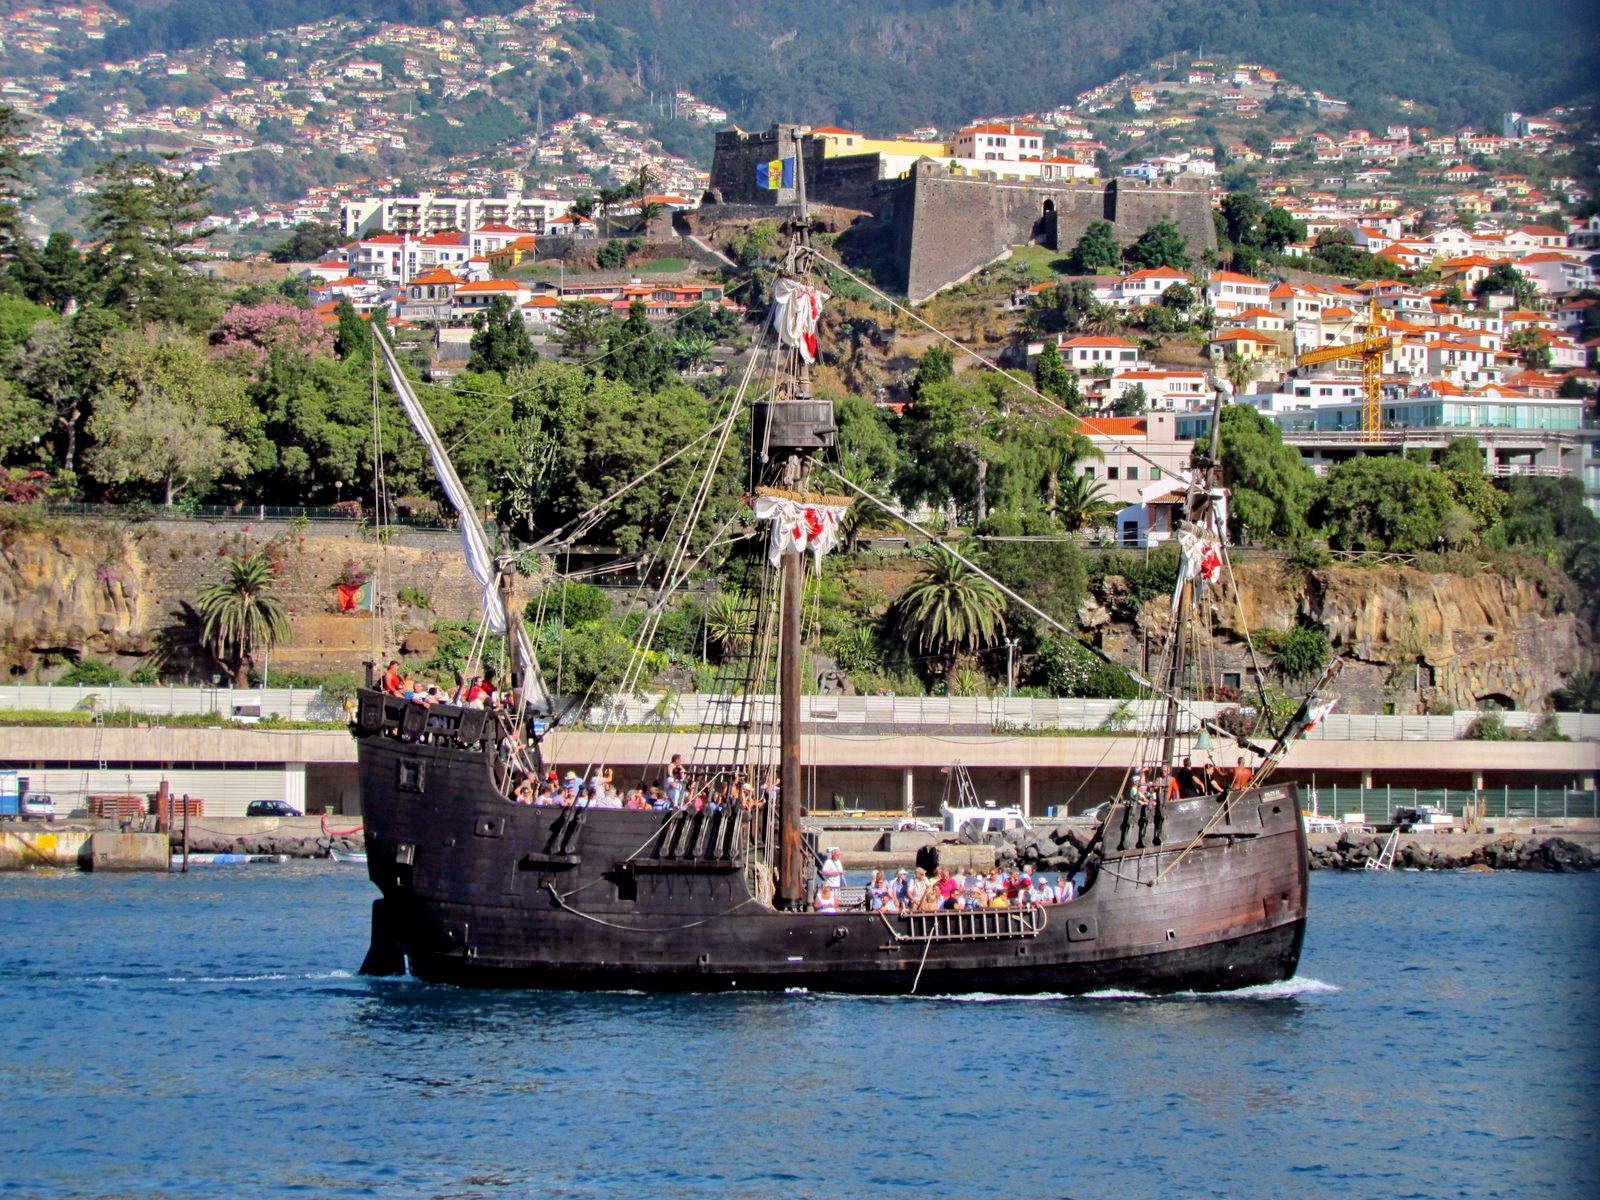 Santa Maria nau begin another trip